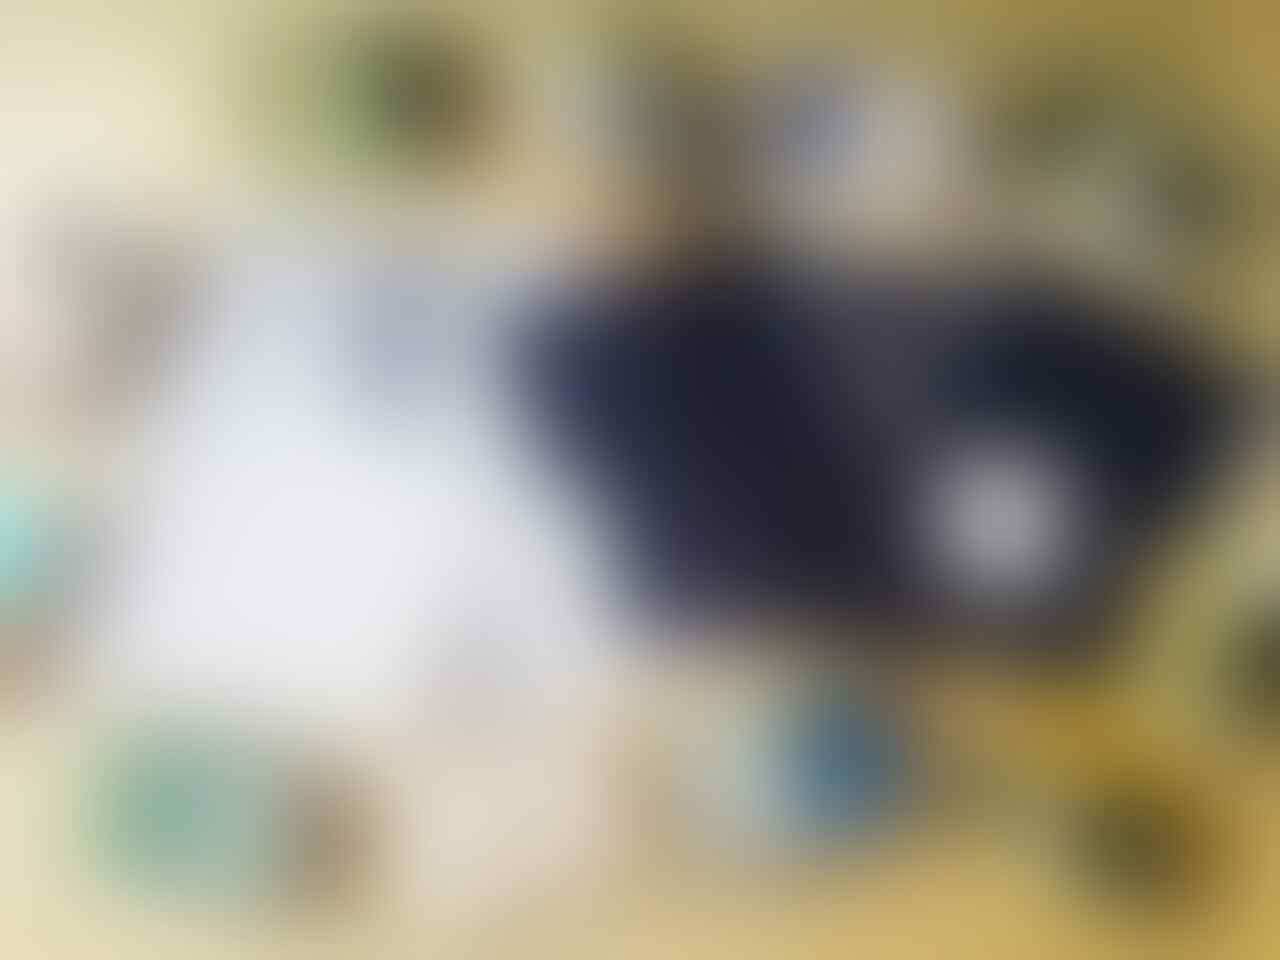 Kaos Cewe Buat Santai/Tidur | Homewear/Sleepwear | BANYAK MODEL !!